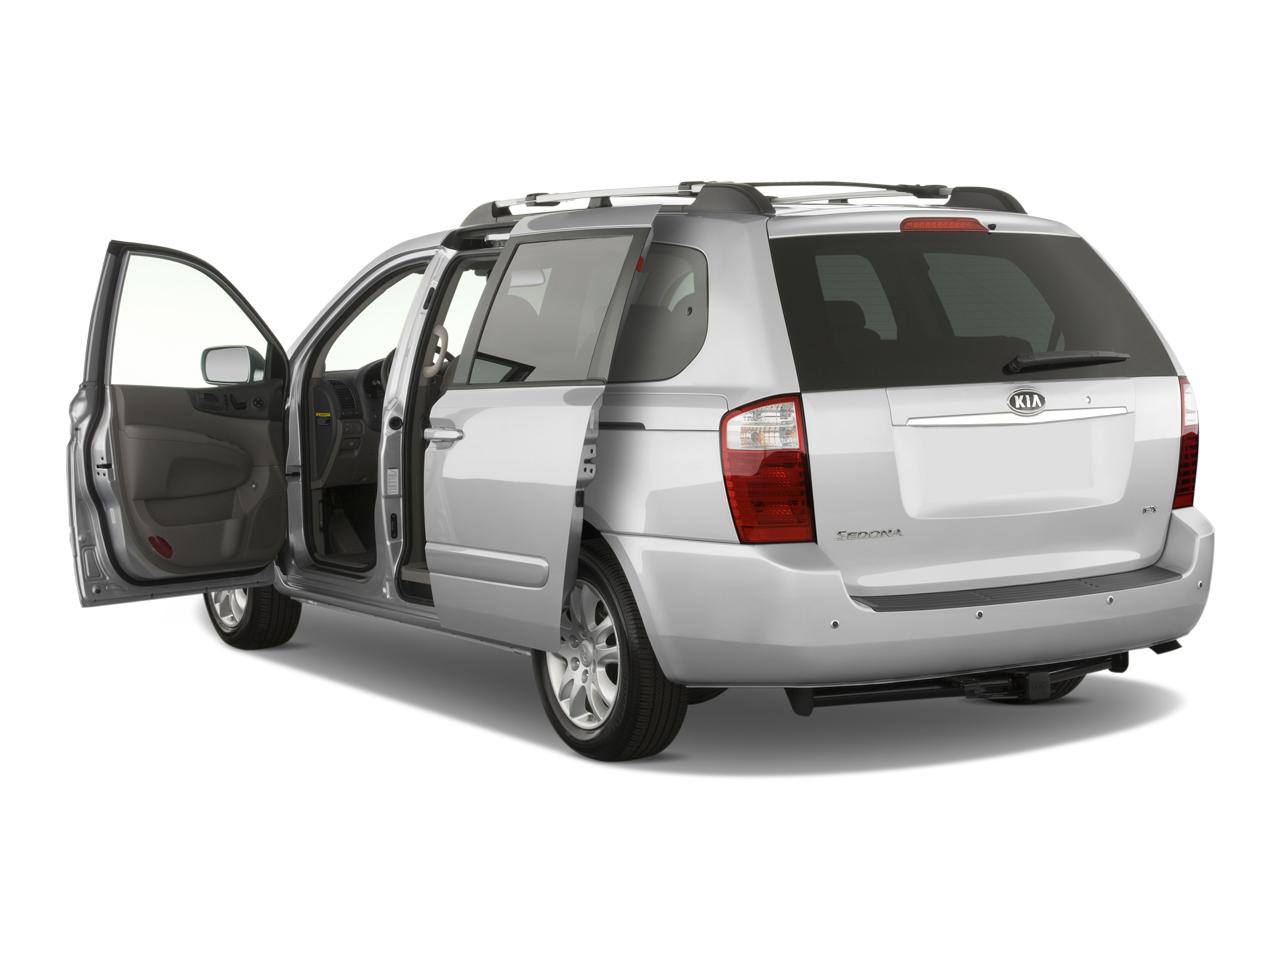 a cars awd lease in canada kia leasecosts sedona automatic l minivan